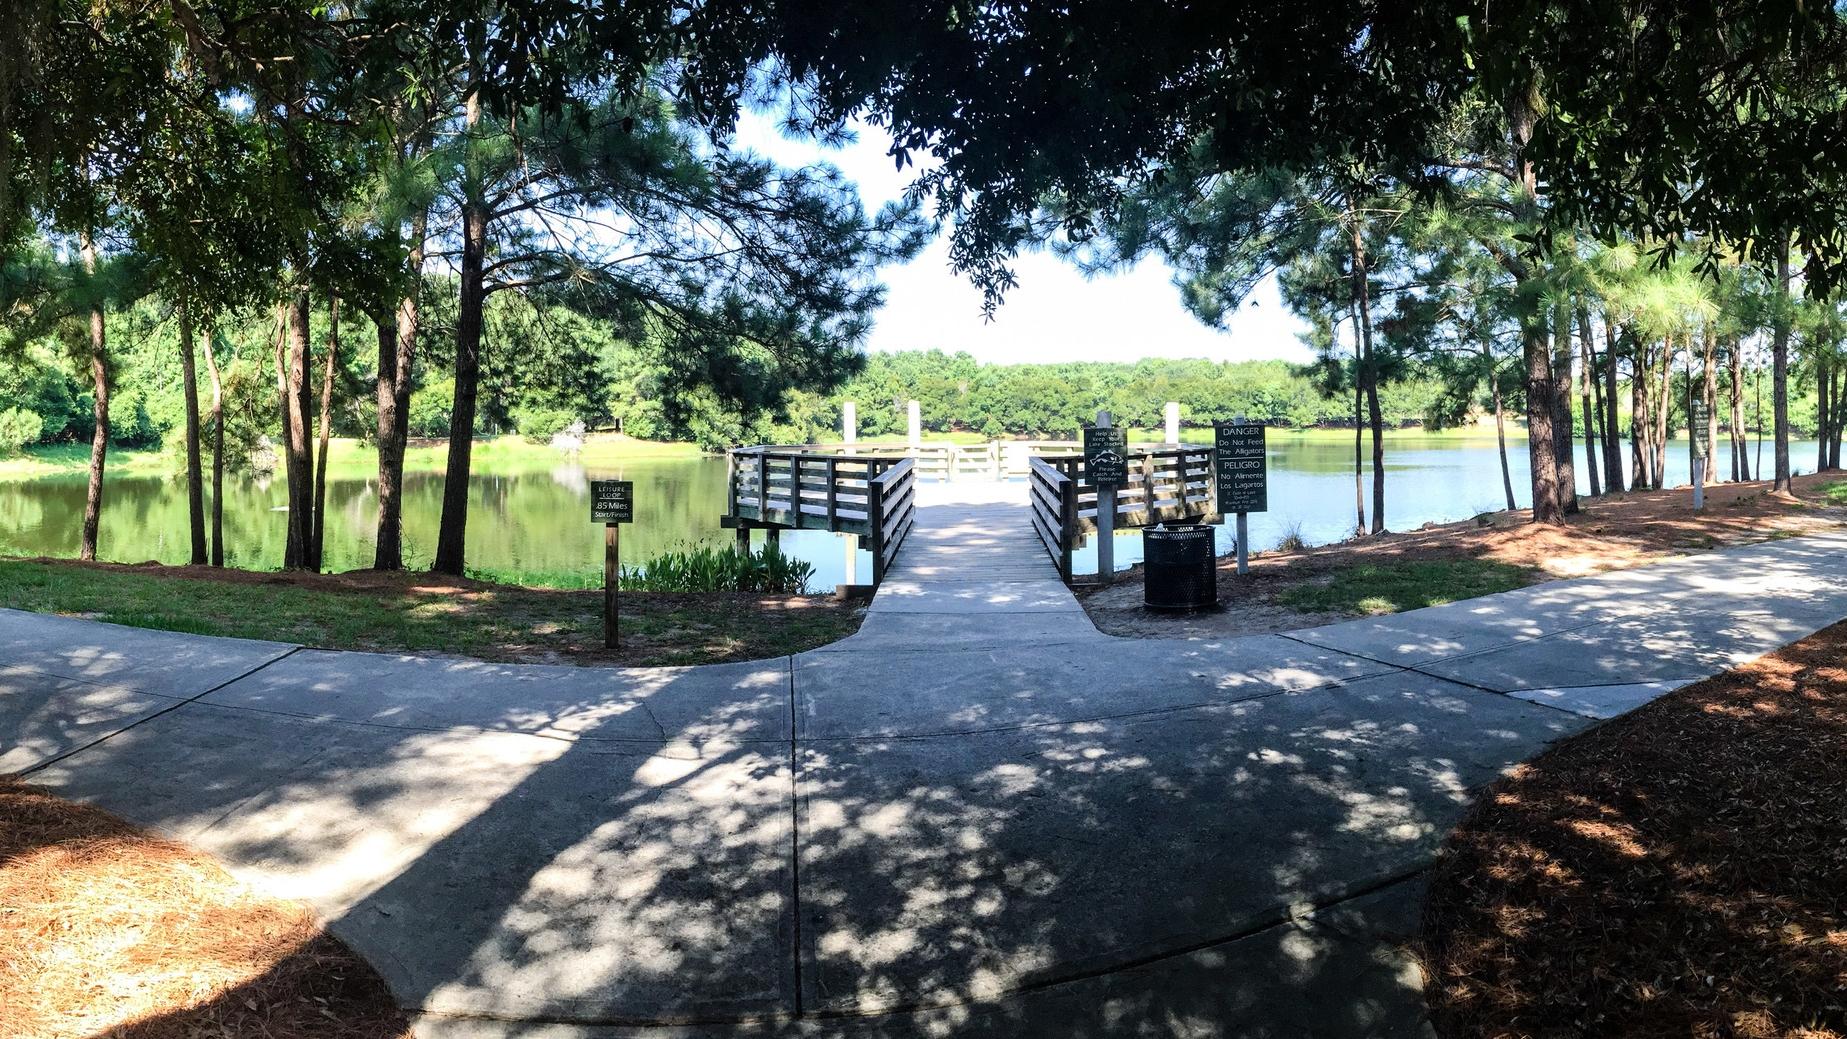 Jarvis Creek Park - 3 Pavilions to rent